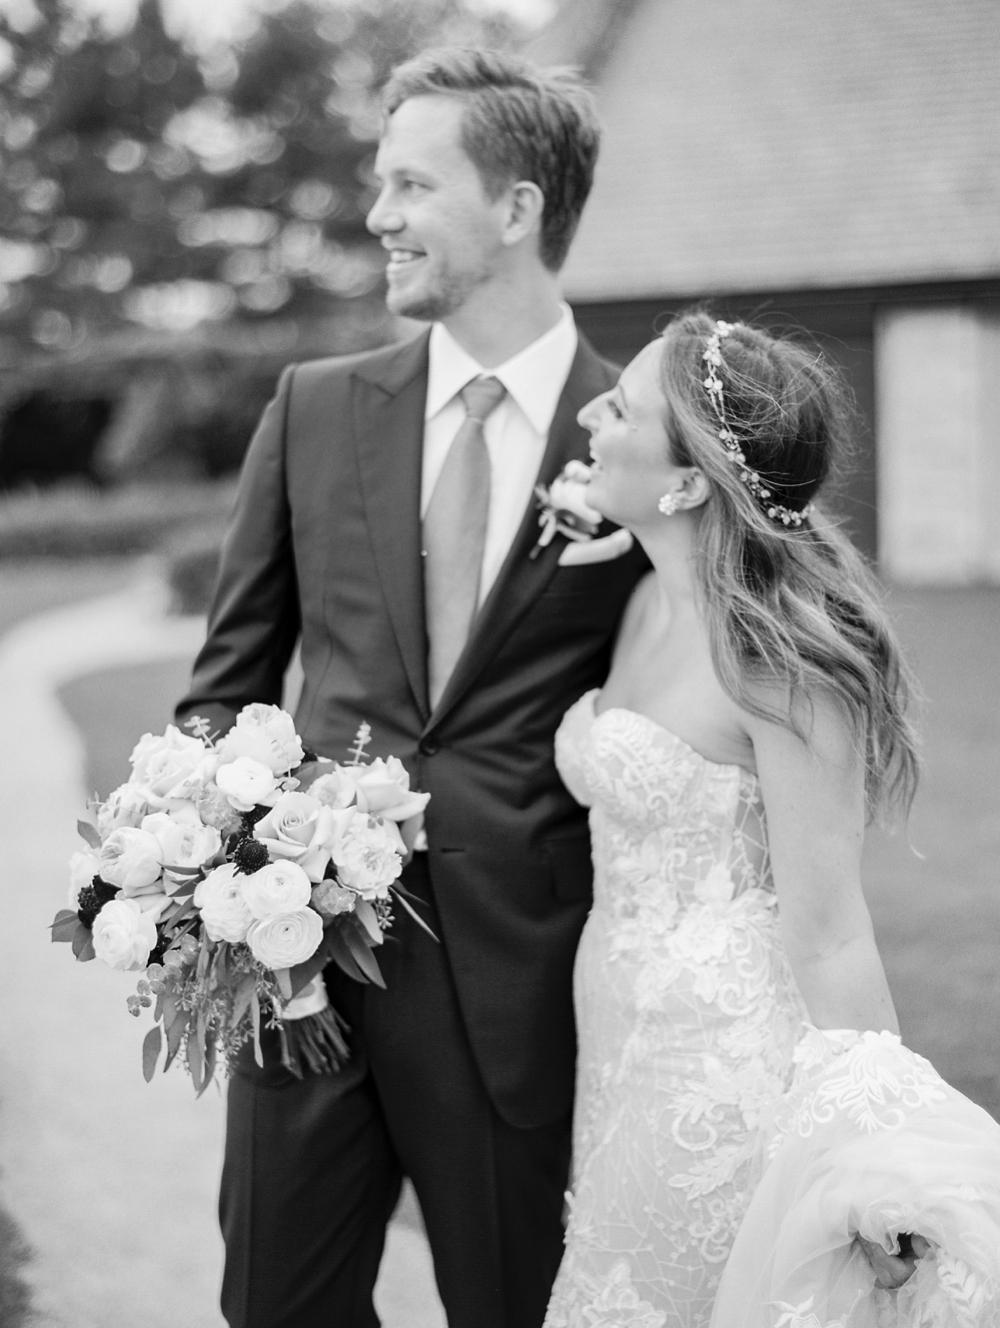 Kristin-La-Voie-Photography-CHICAGO-WEDDING-PHOTOGRAPHER-KOHLER-WHISTLING-STRAITS-97